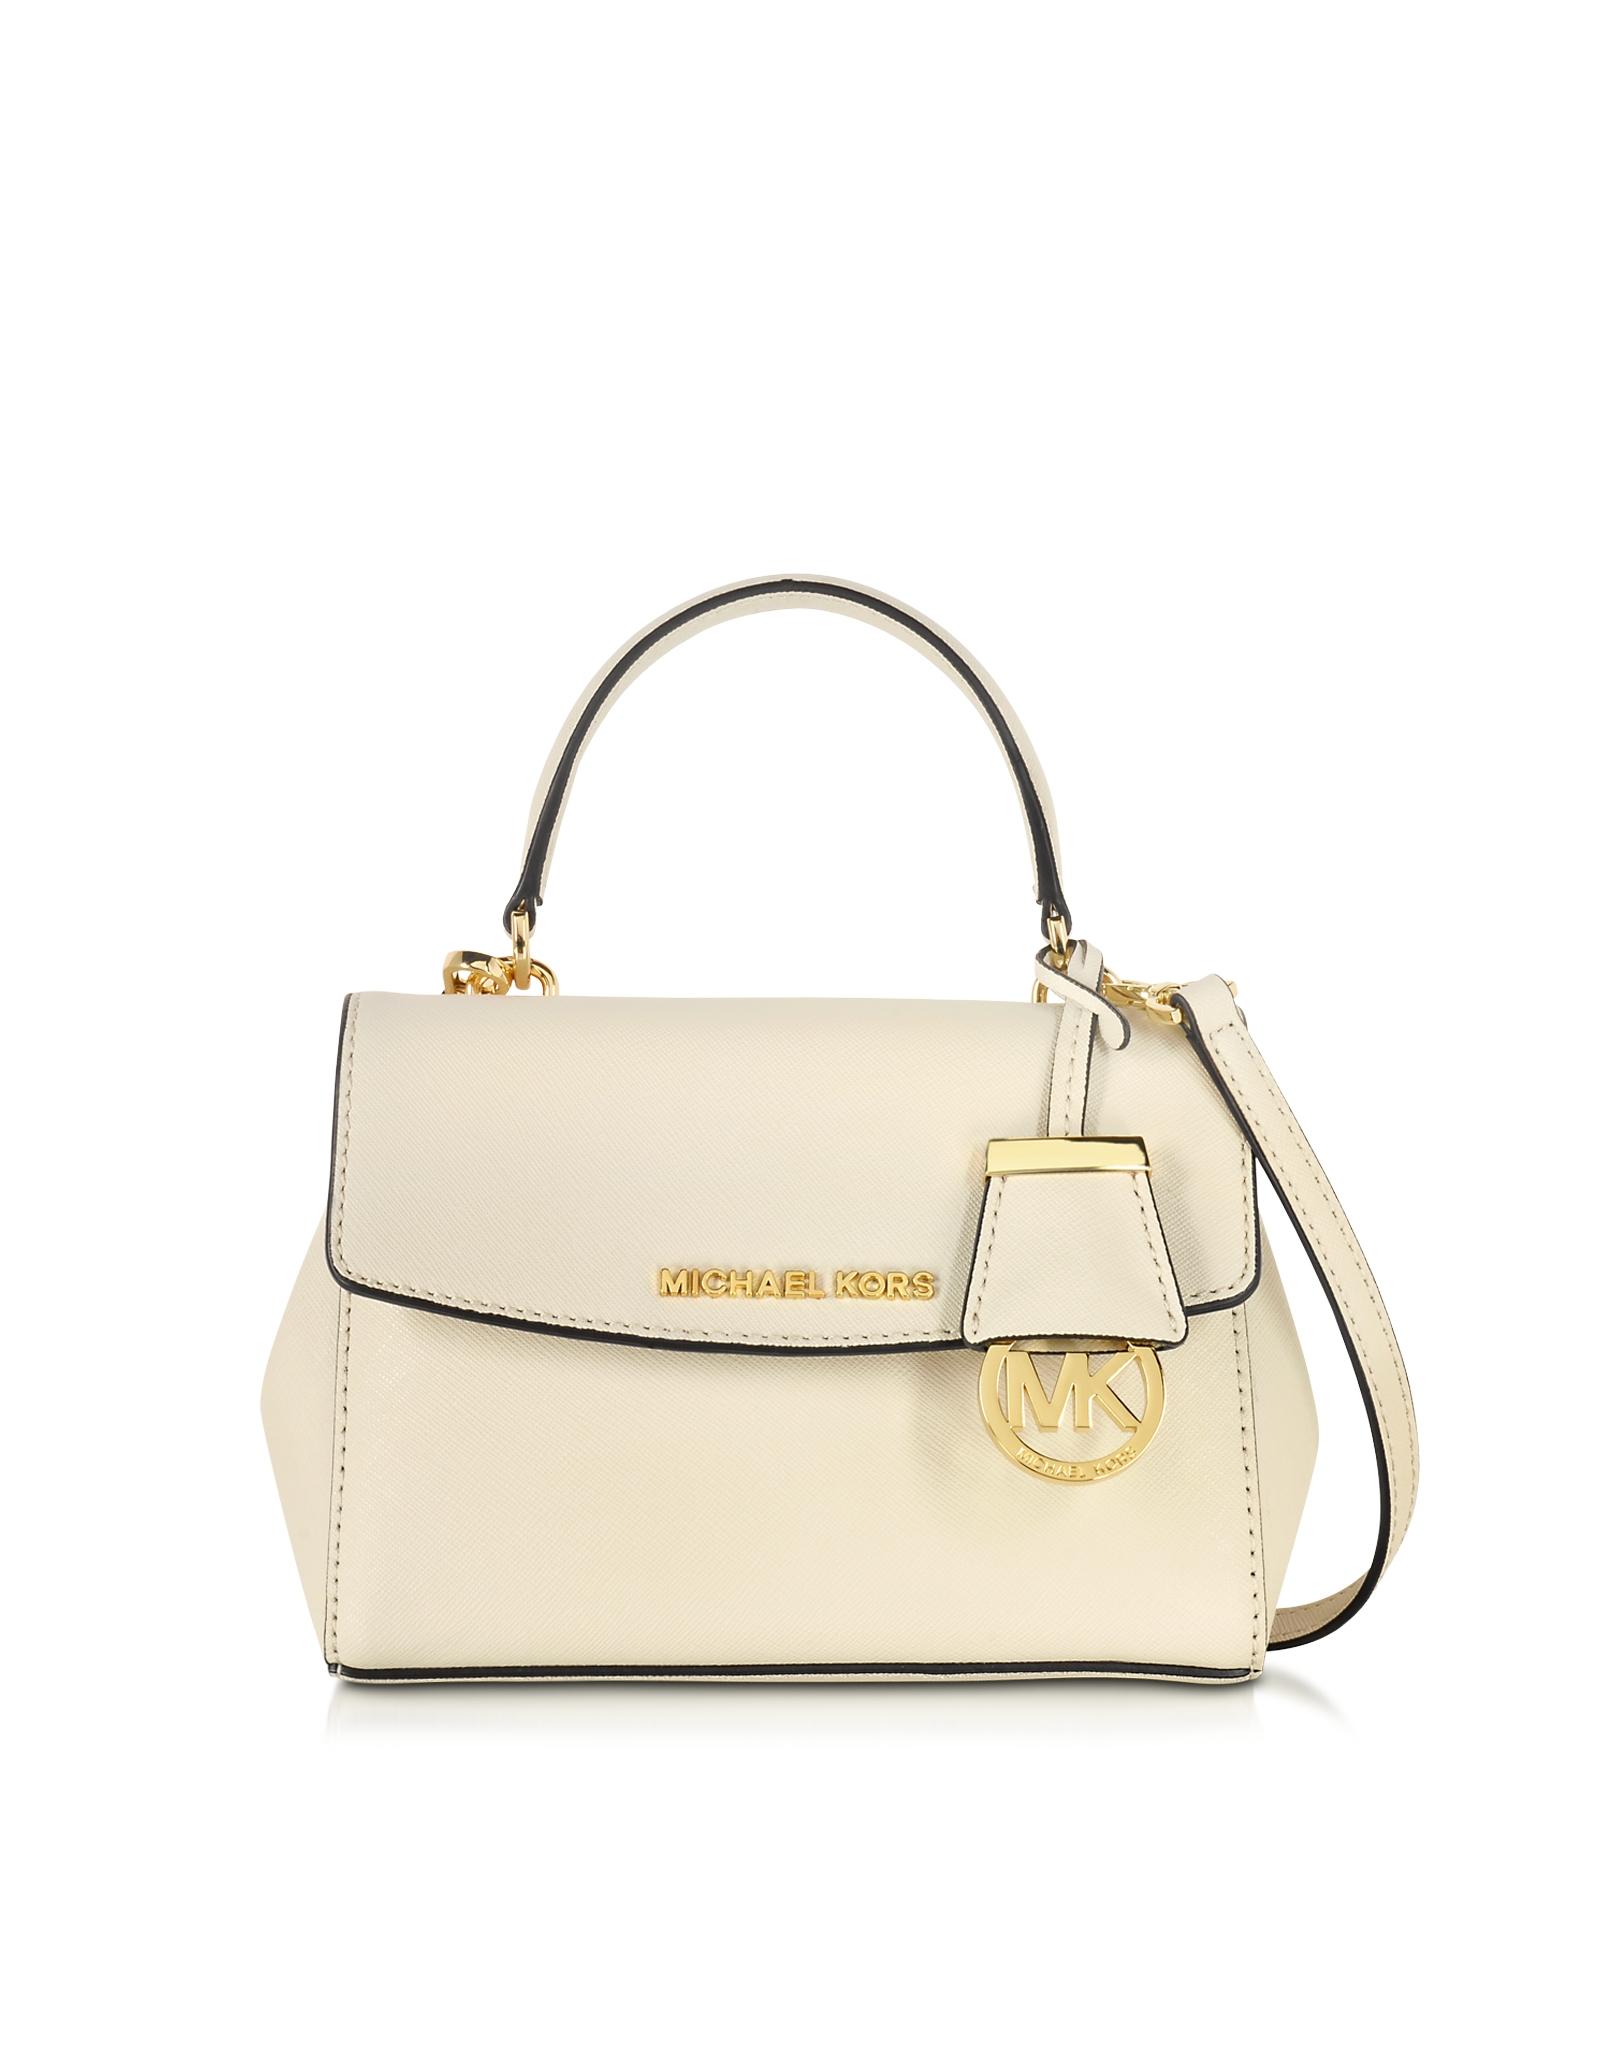 89e3065d36be Michael Kors Ava Ecru Saffiano Leather Extra Small Crossbody Bag in ...